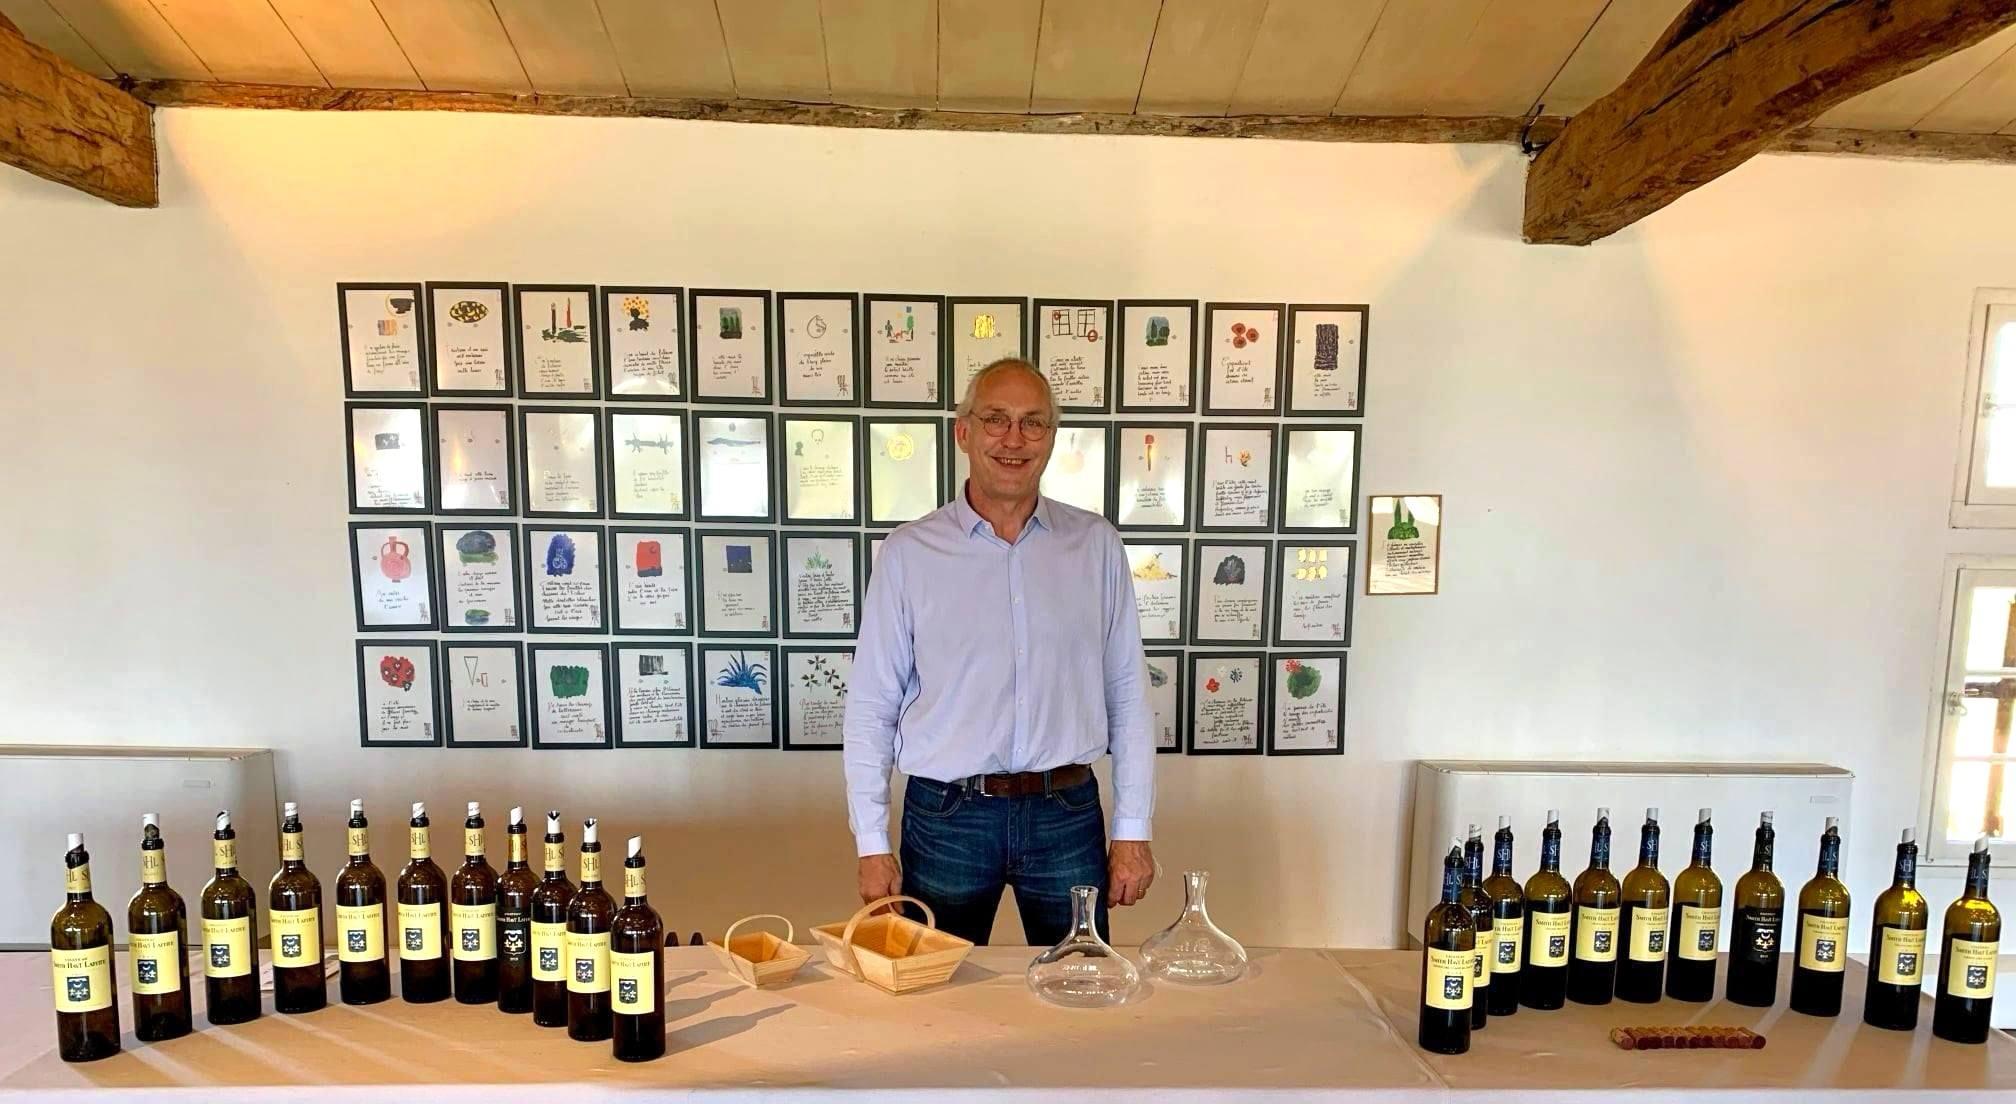 Château Smith Haut Lafitte Vertical Tasting (2008-2018) - Alexandre MA